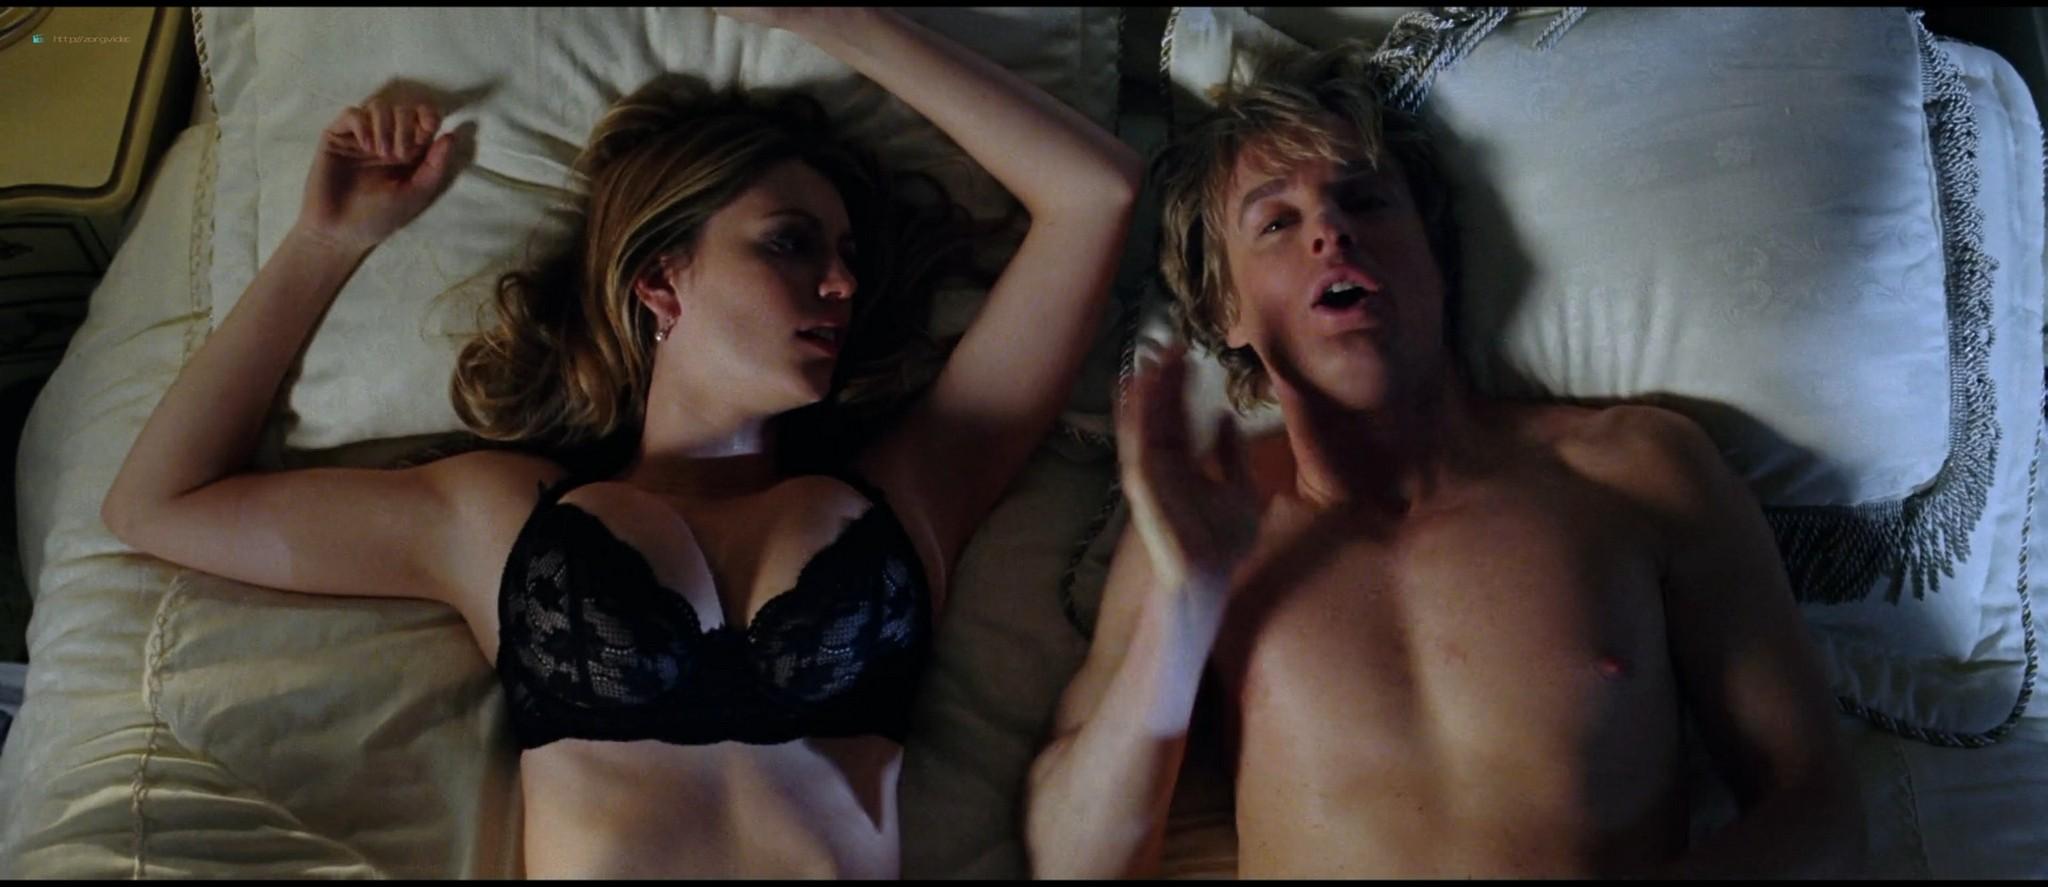 Diora Baird nude topless huge boobs others nude too - Wedding Crashers (2005) HD 1080p BluRay (3)